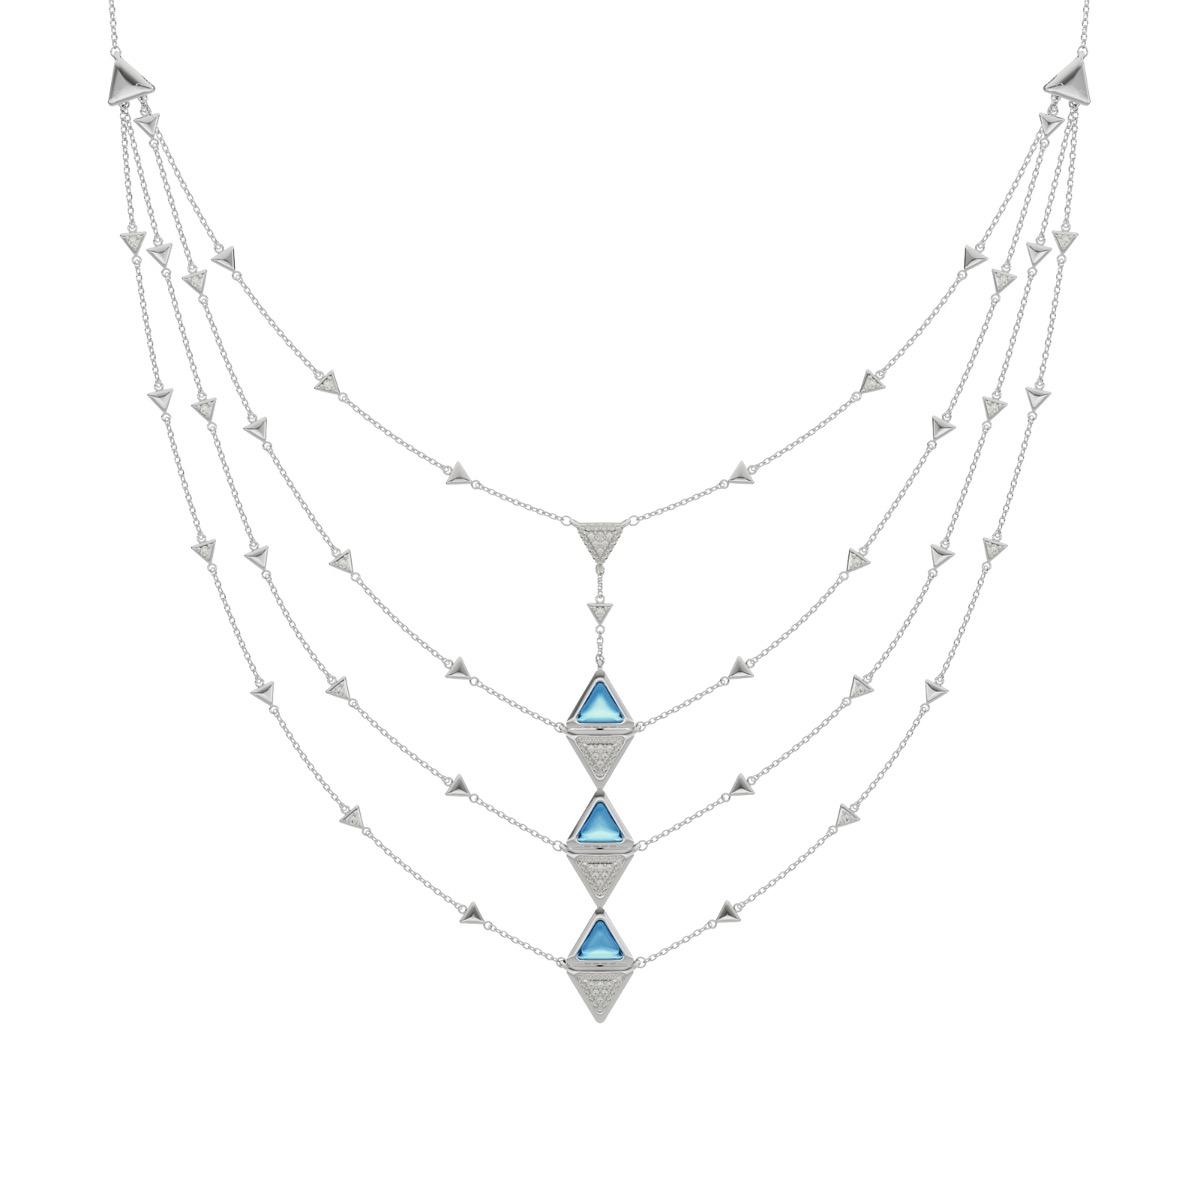 Necklace Multi Mirror Exquisite White Gold Blue Topaz and Diamonds